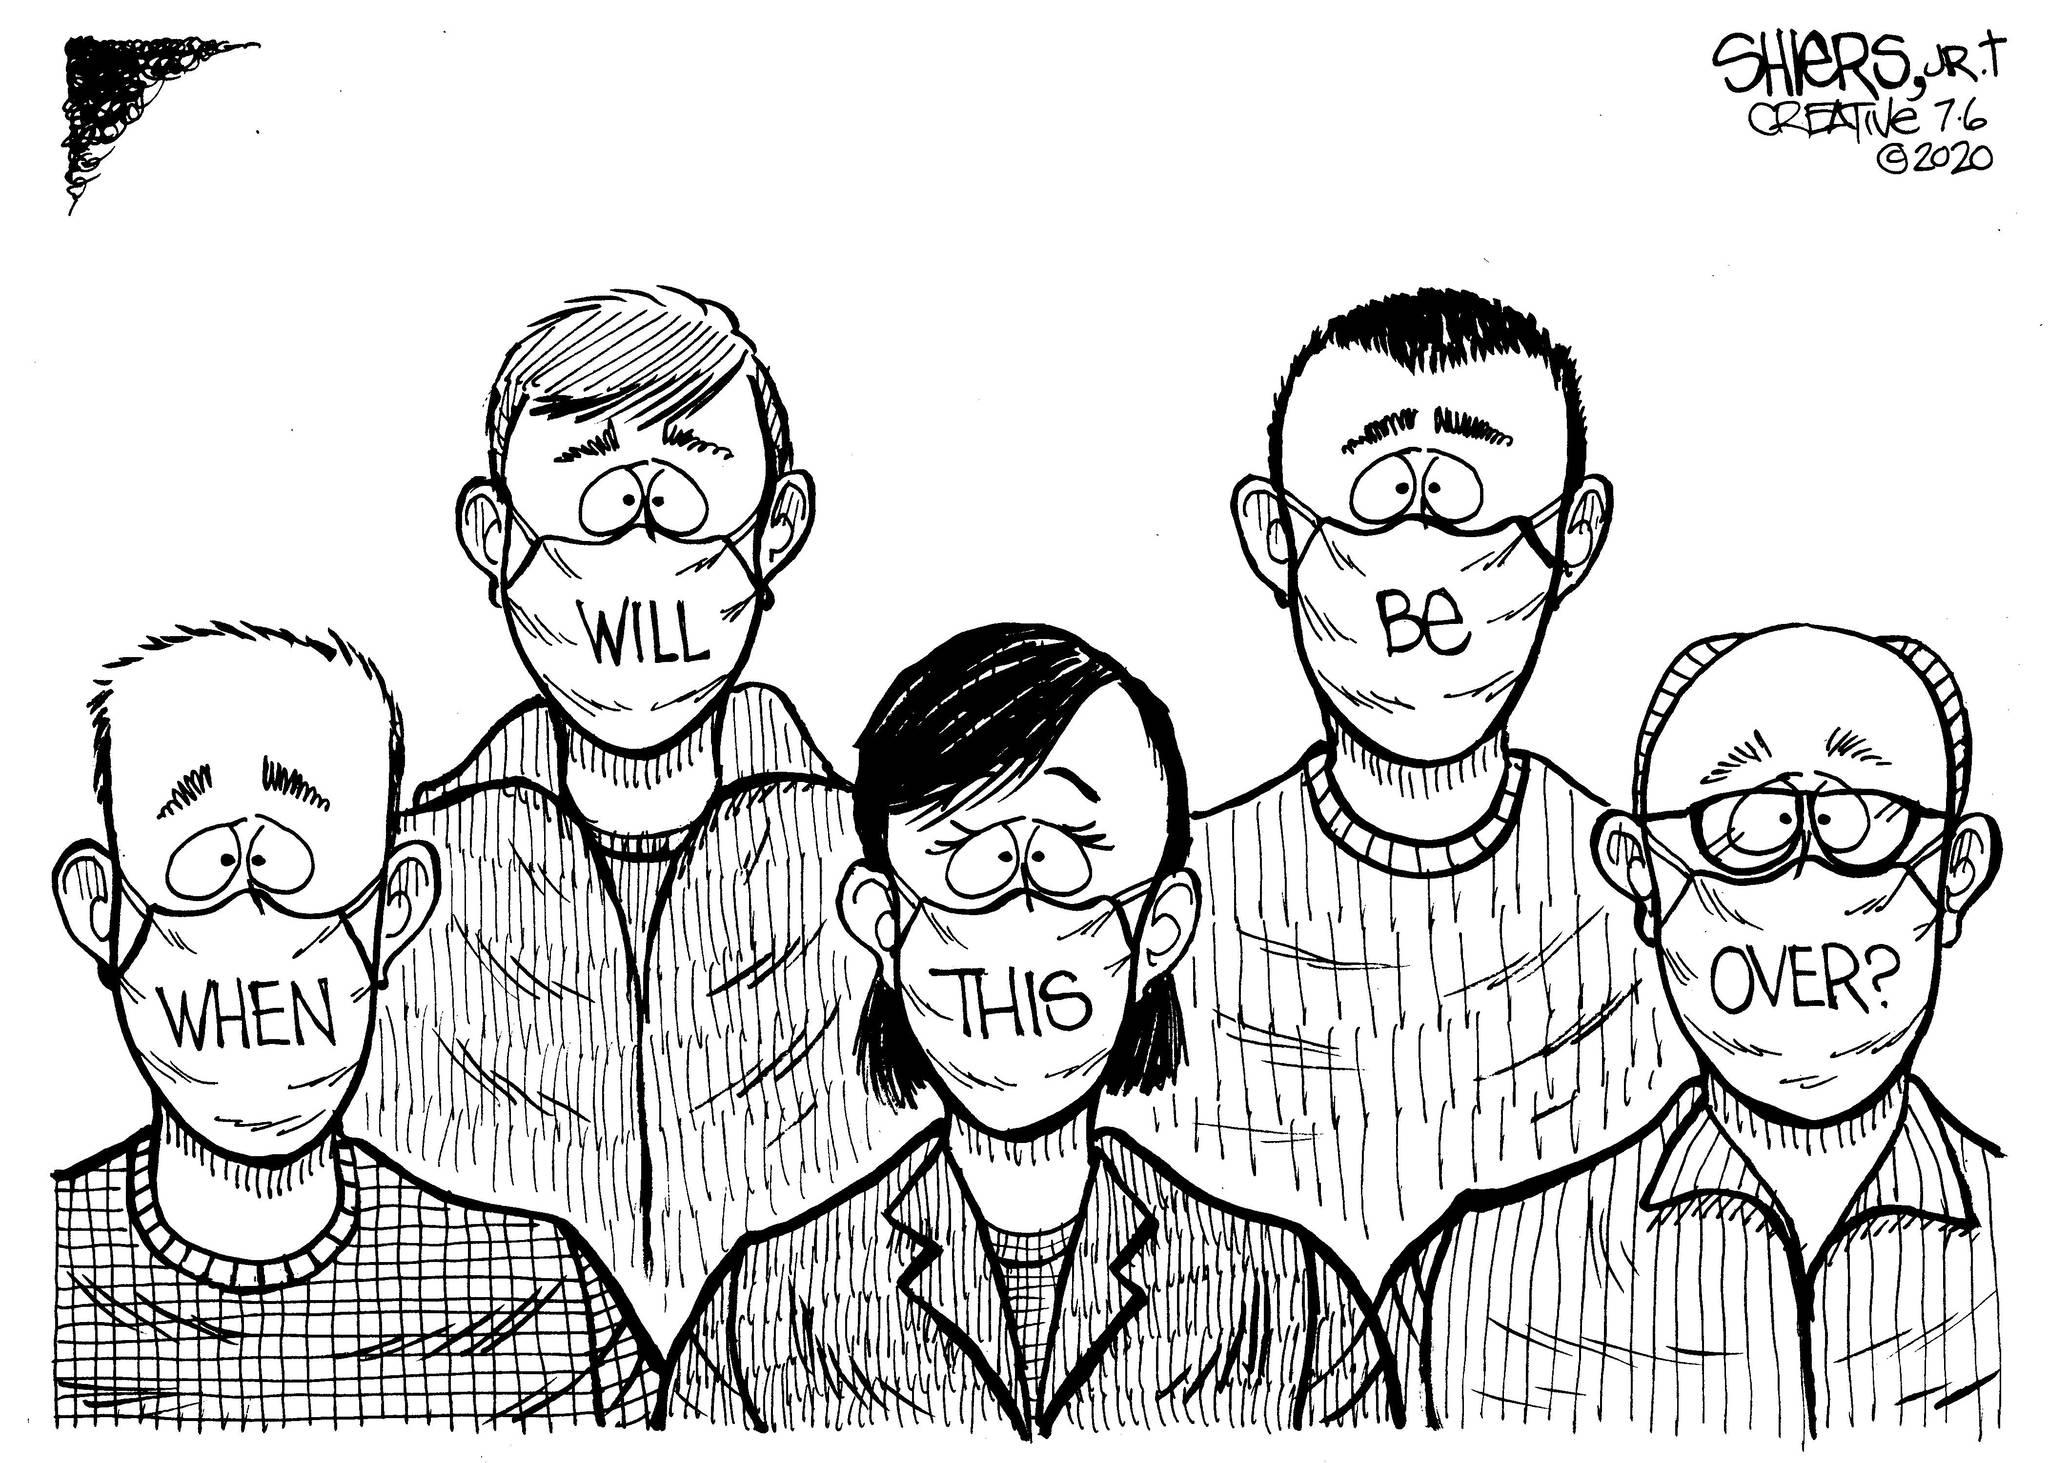 Cartoon by Frank Shiers